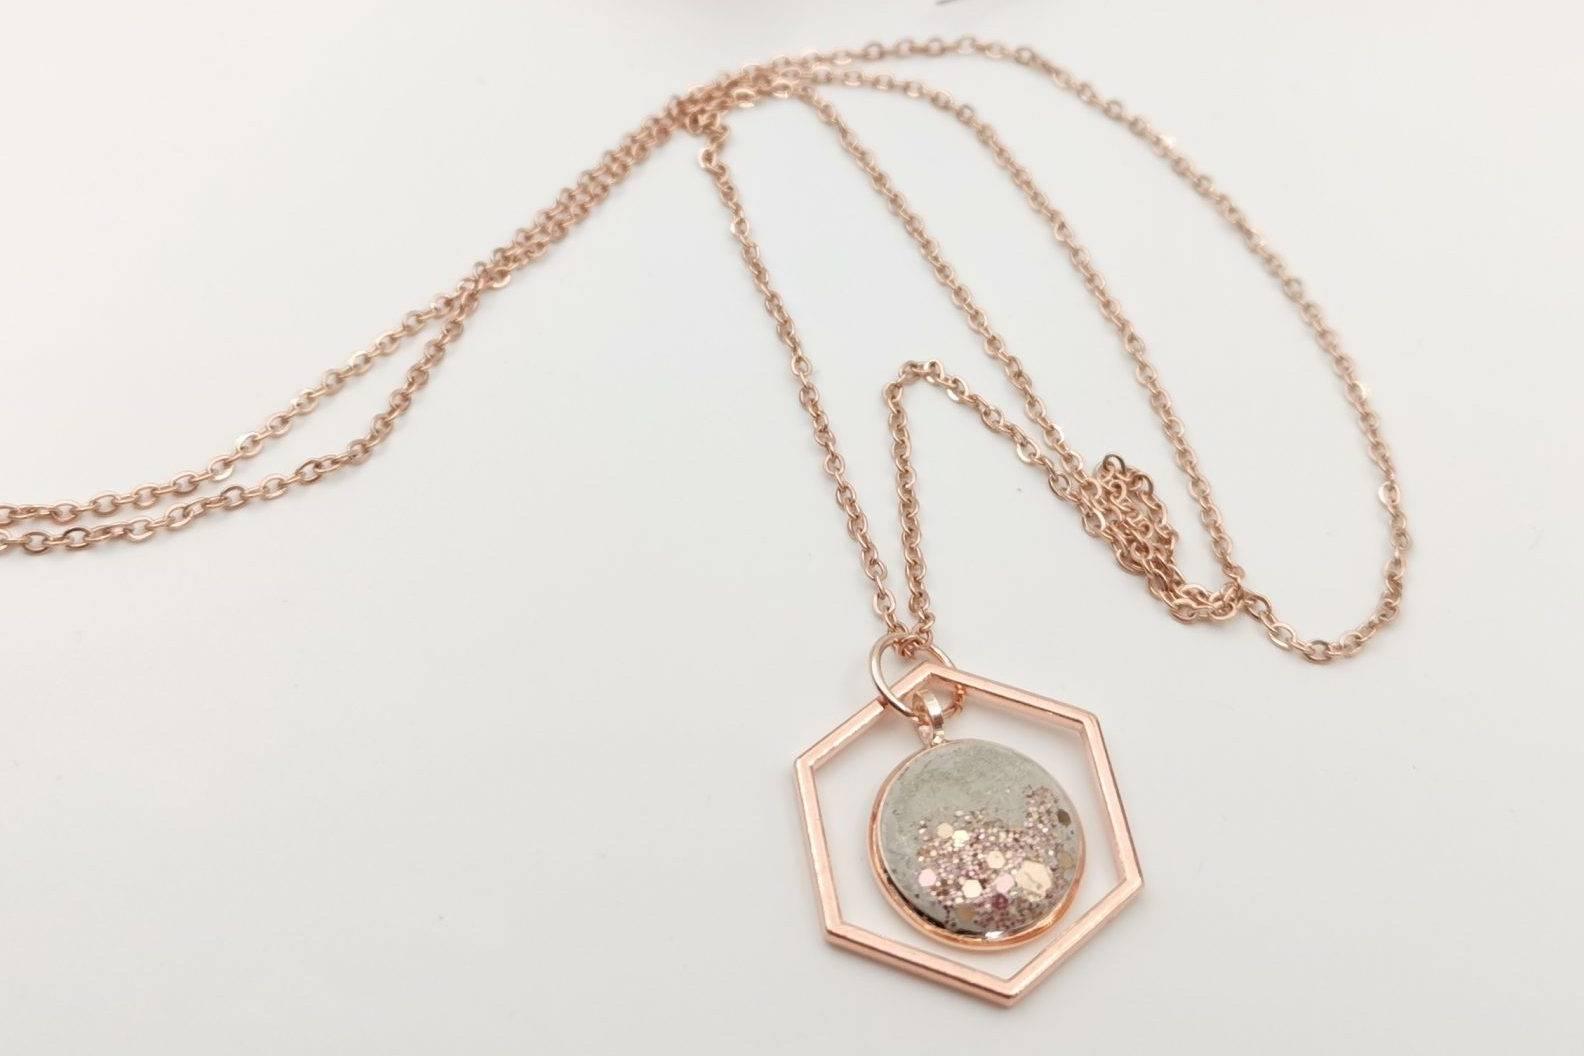 GlanzundSchimmer-Halskette-Rosegold